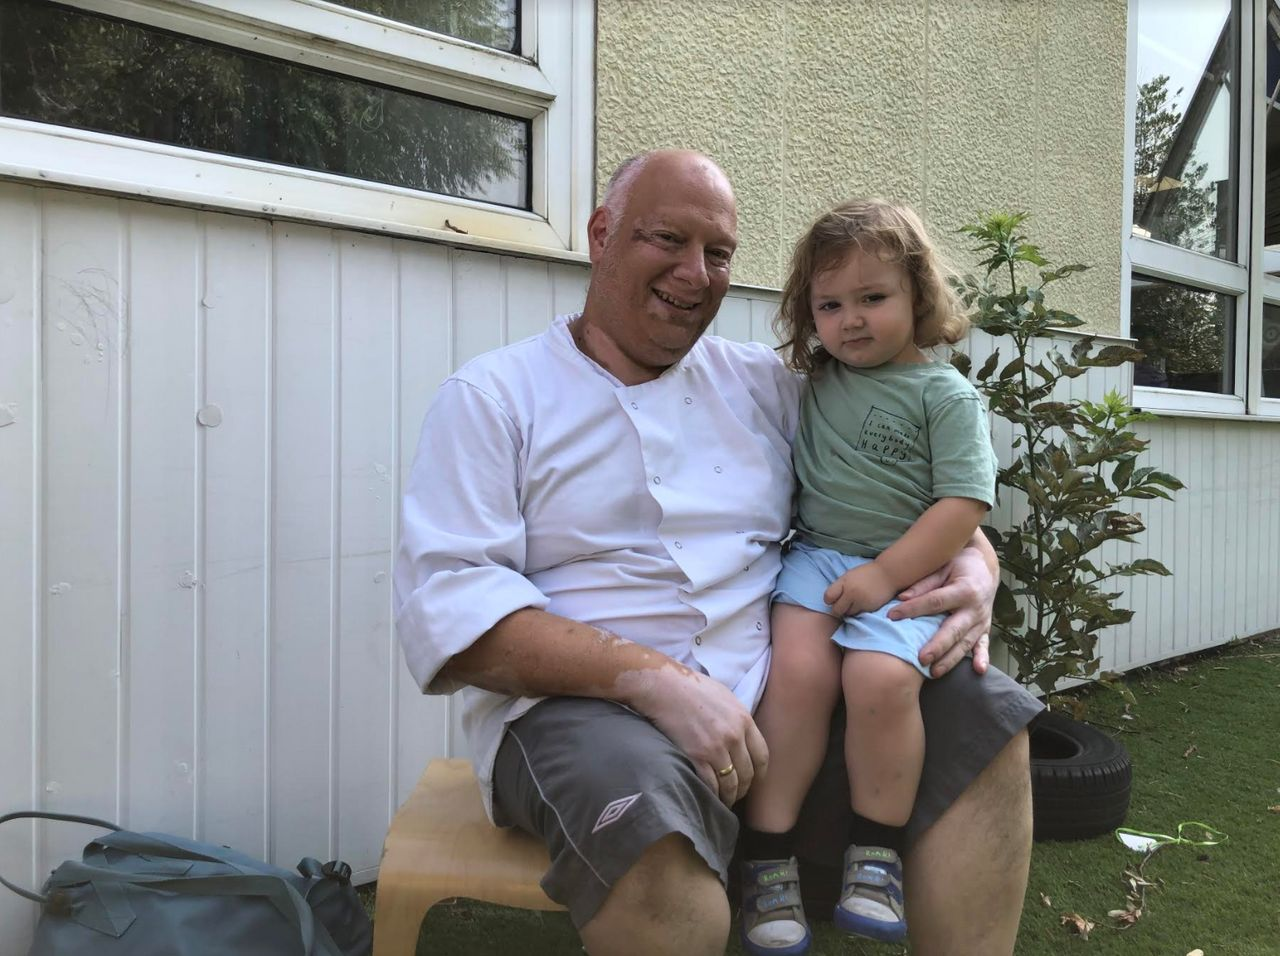 Tony Savage with his son Aidan, 2.